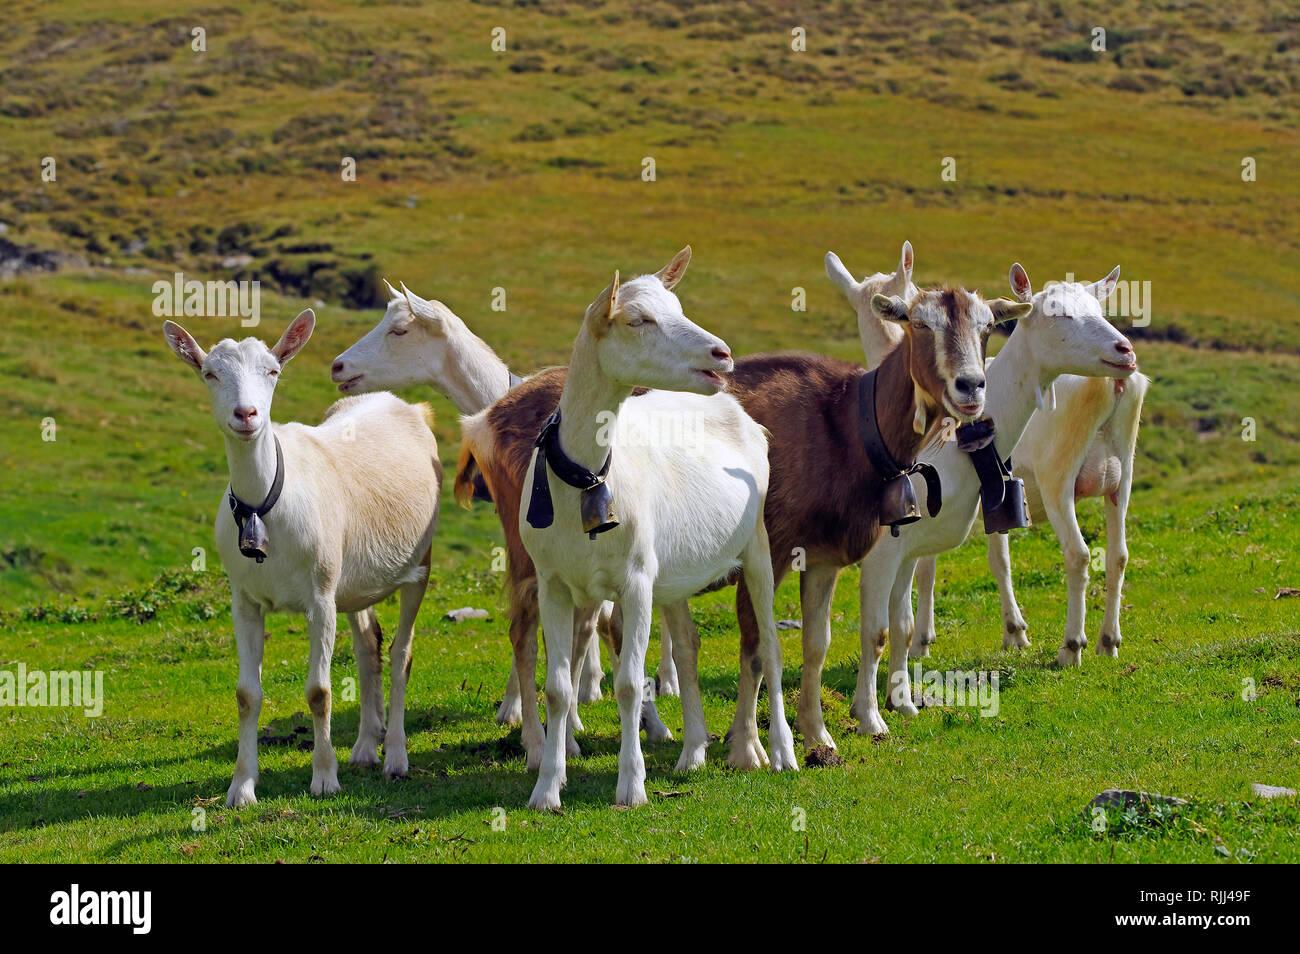 Saanen Goats Stock Photos & Saanen Goats Stock Images - Alamy